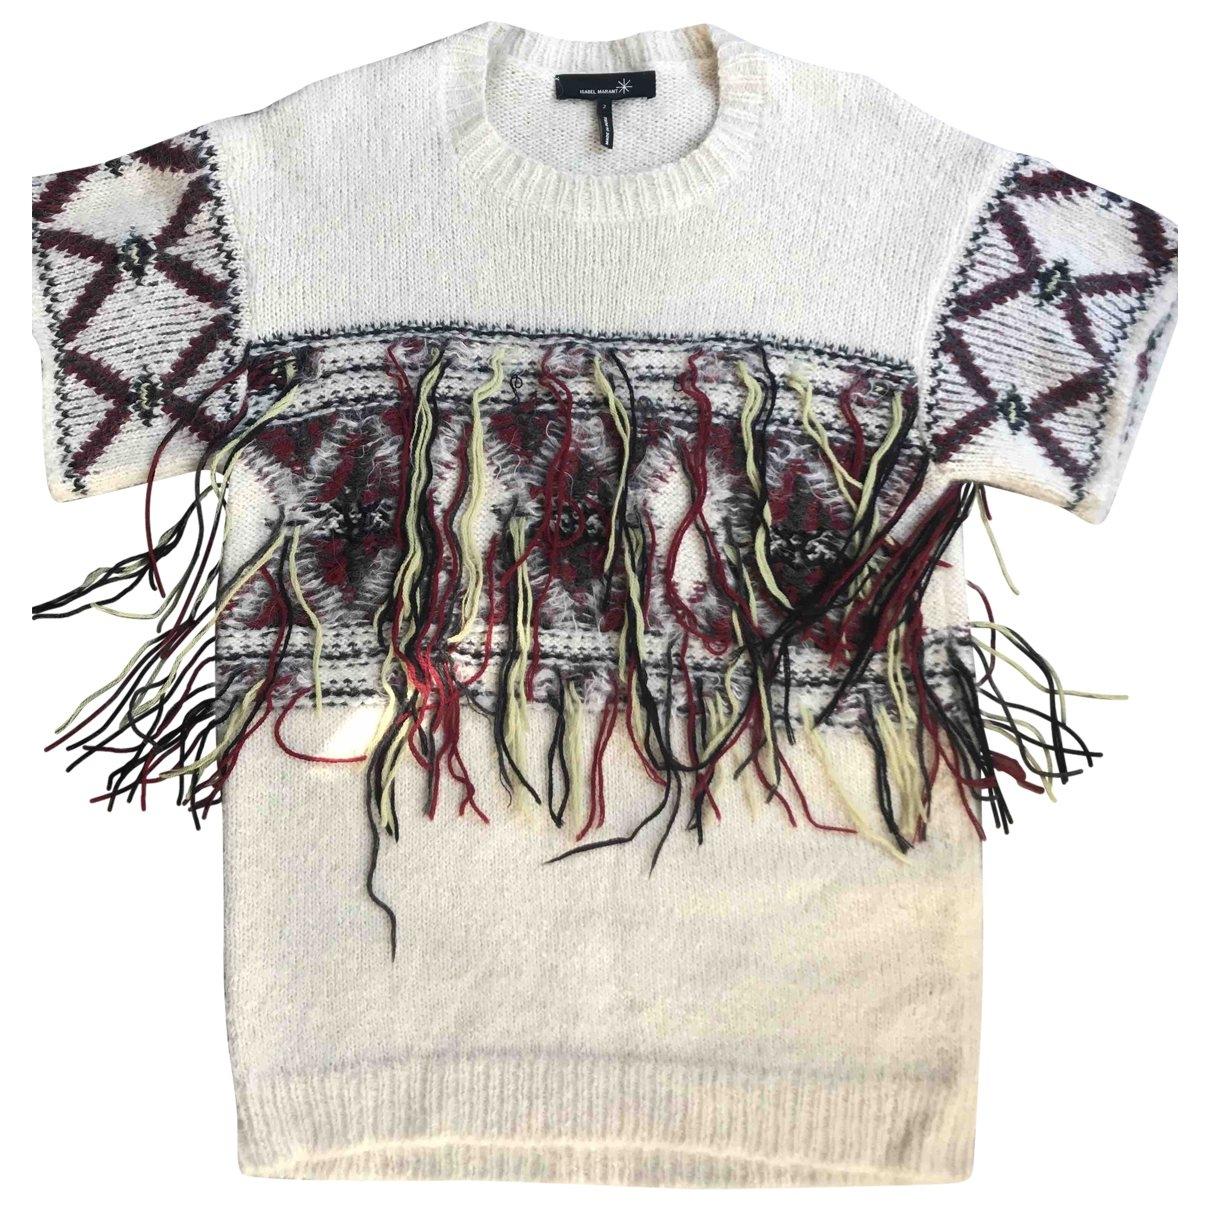 Isabel Marant \N Ecru Wool  top for Women M